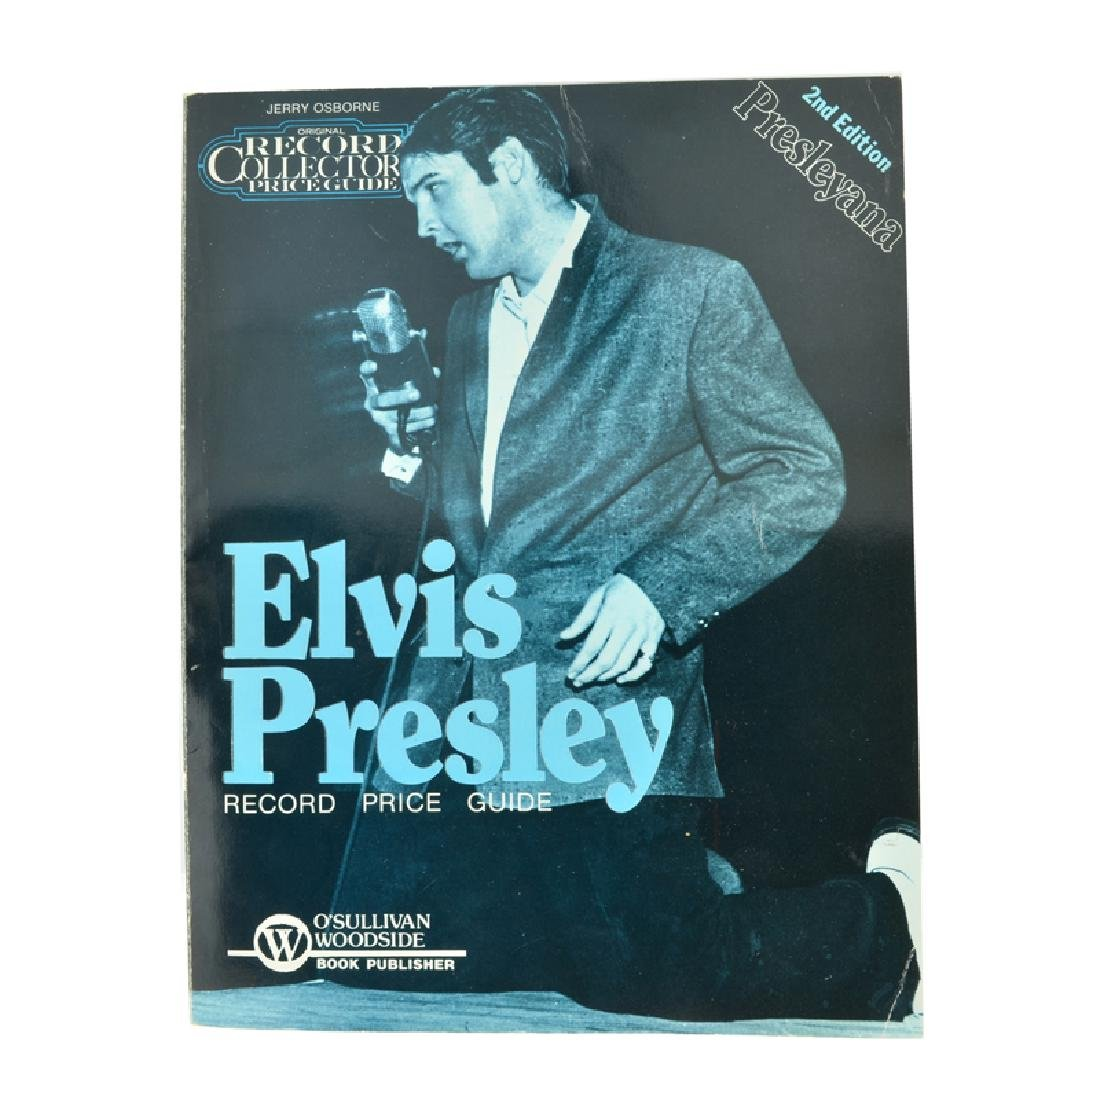 Presleyana: Elvis Presley Price Guide 2nd Edition